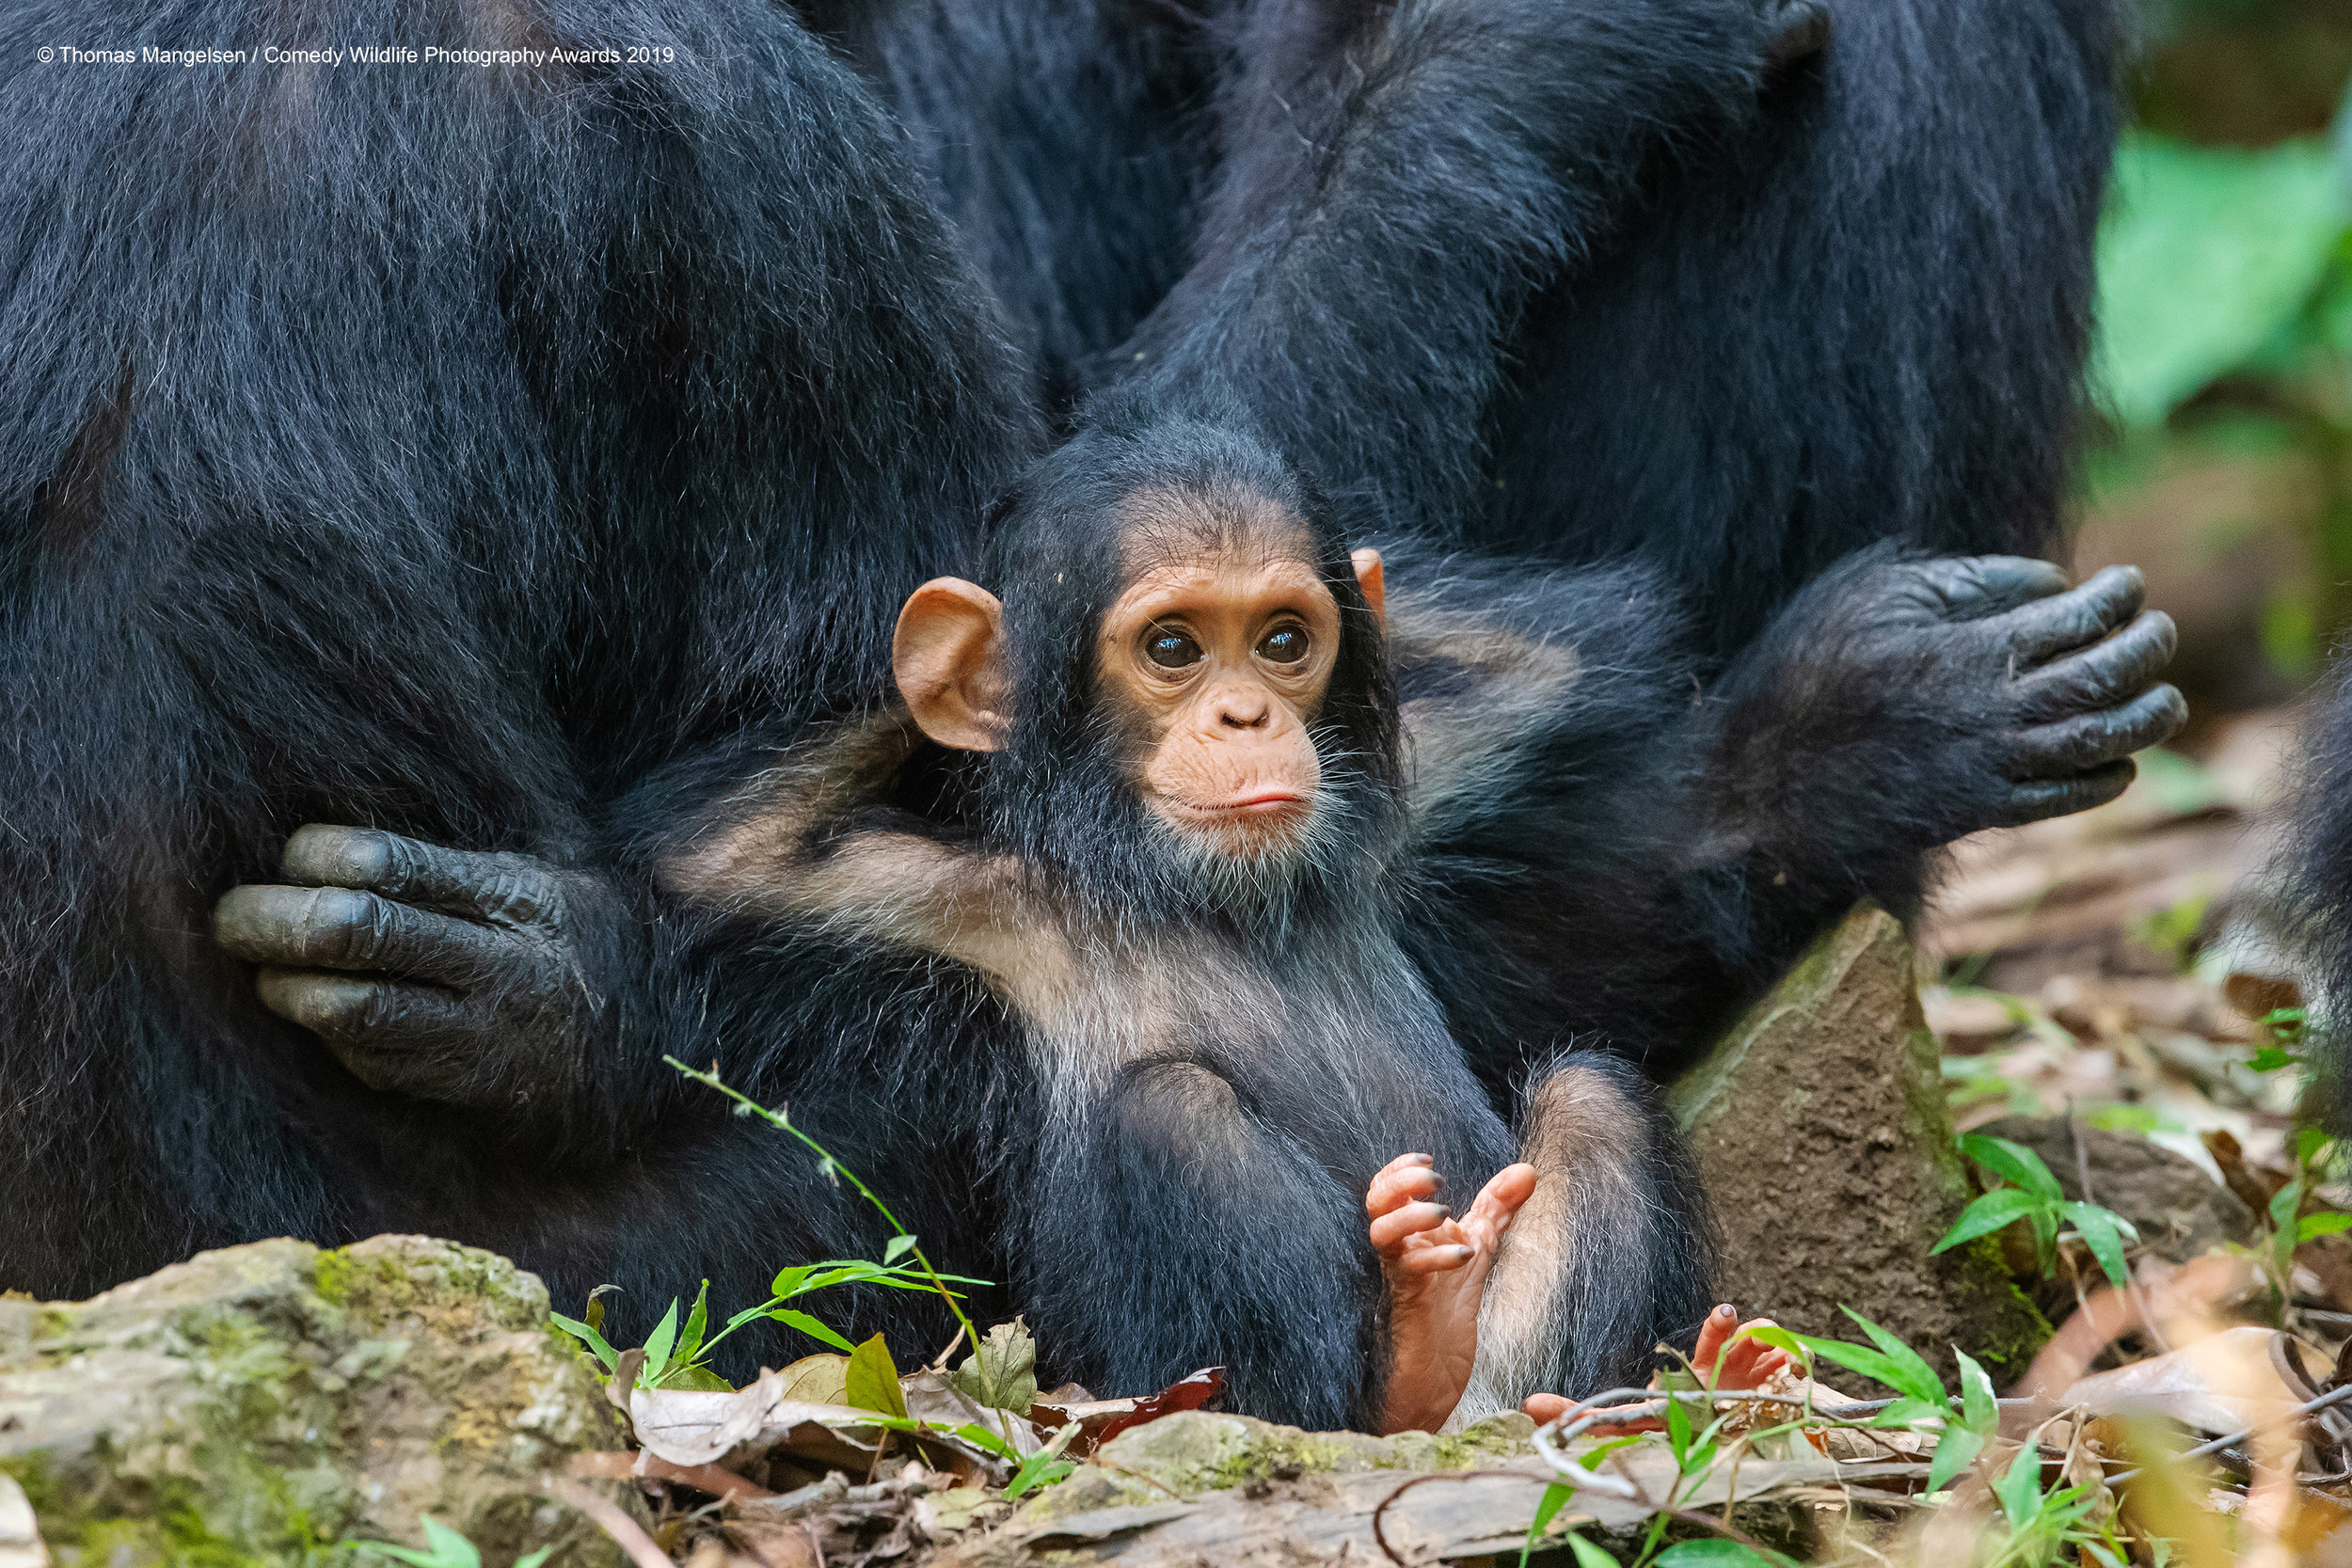 'Laid Back' by Thomas Mangelsen ©. Courtesy of Comedy Wildlife Photography Awards.